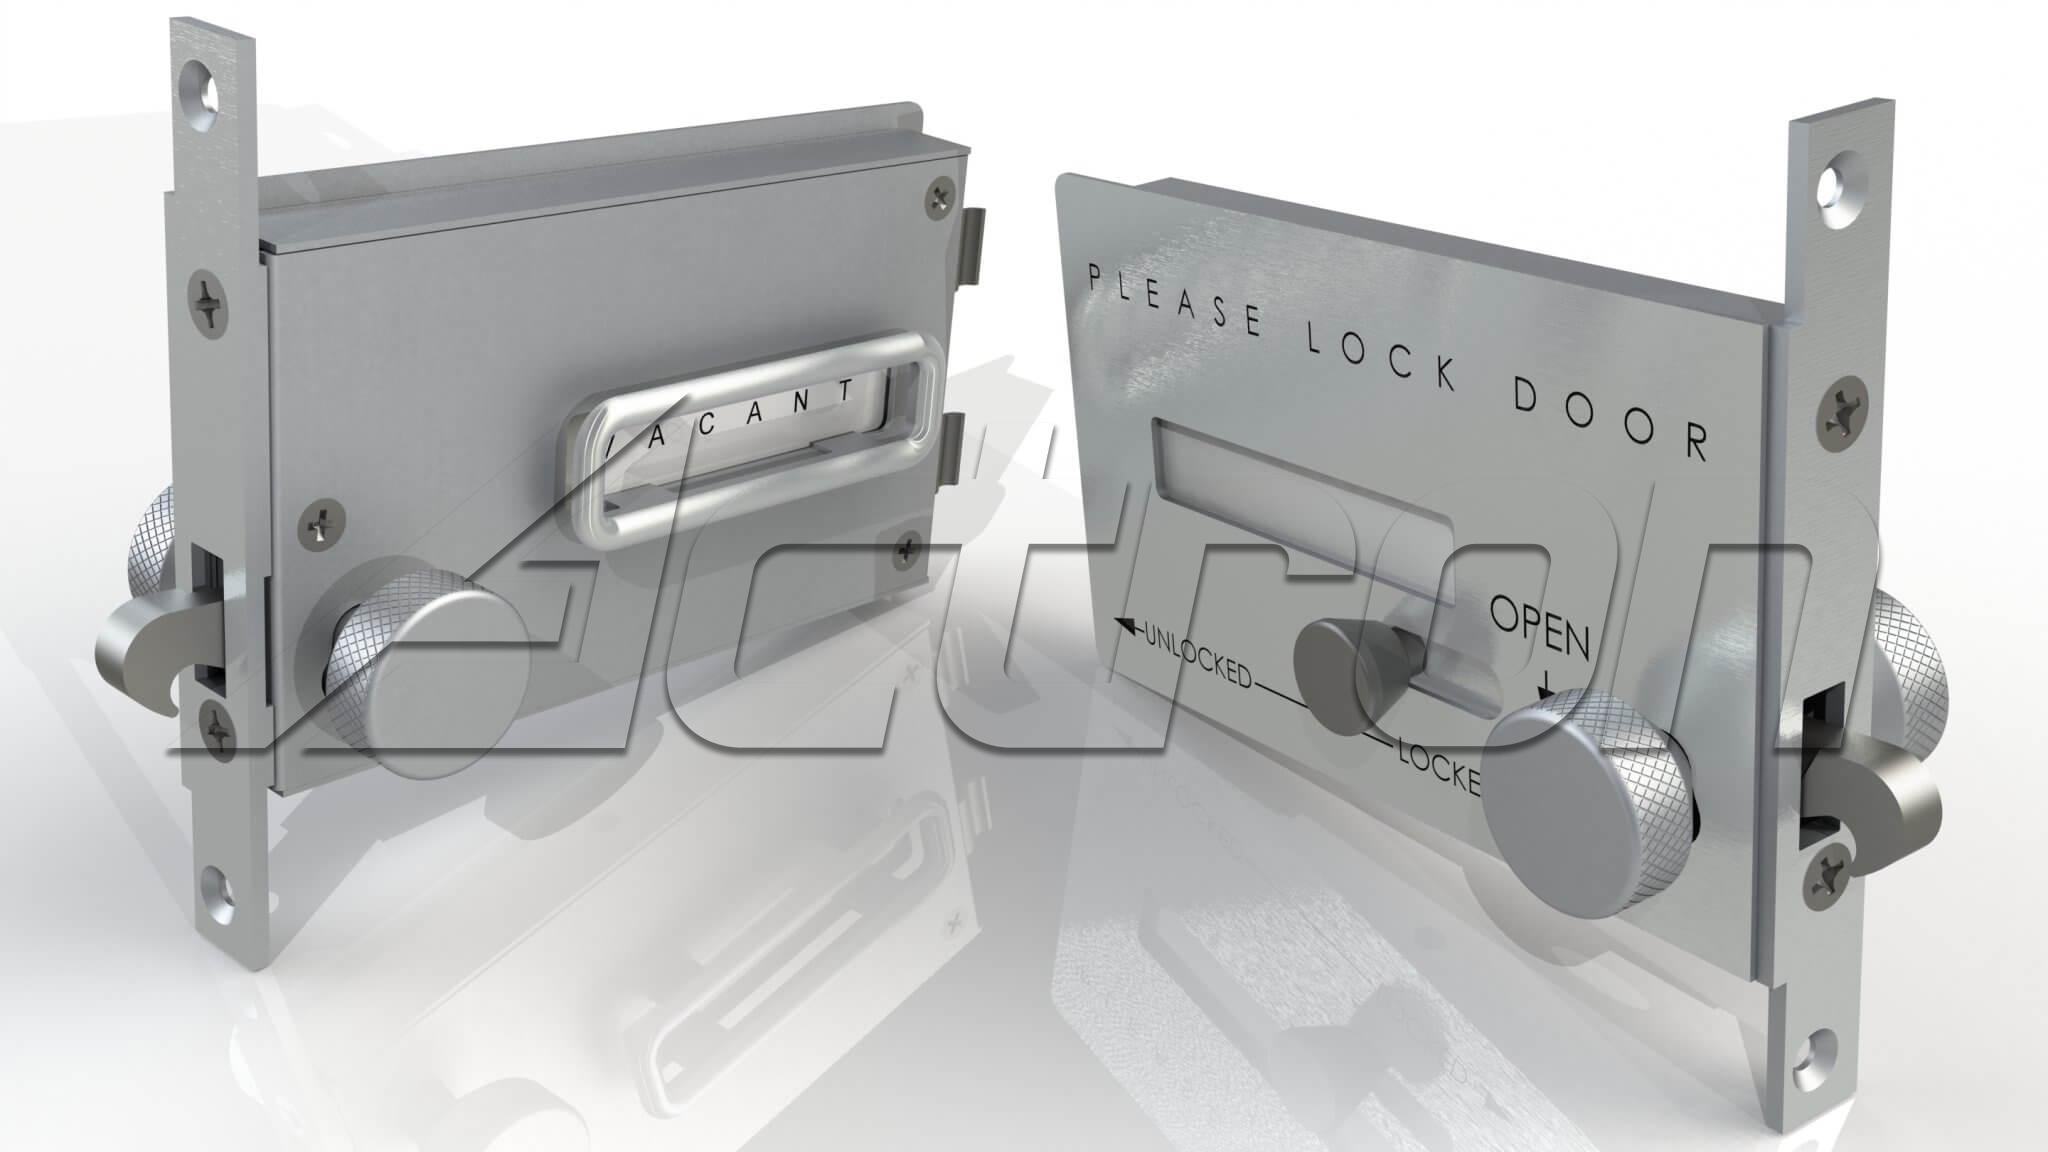 latch-assy-8211-lavatory-4974-a41124.jpg